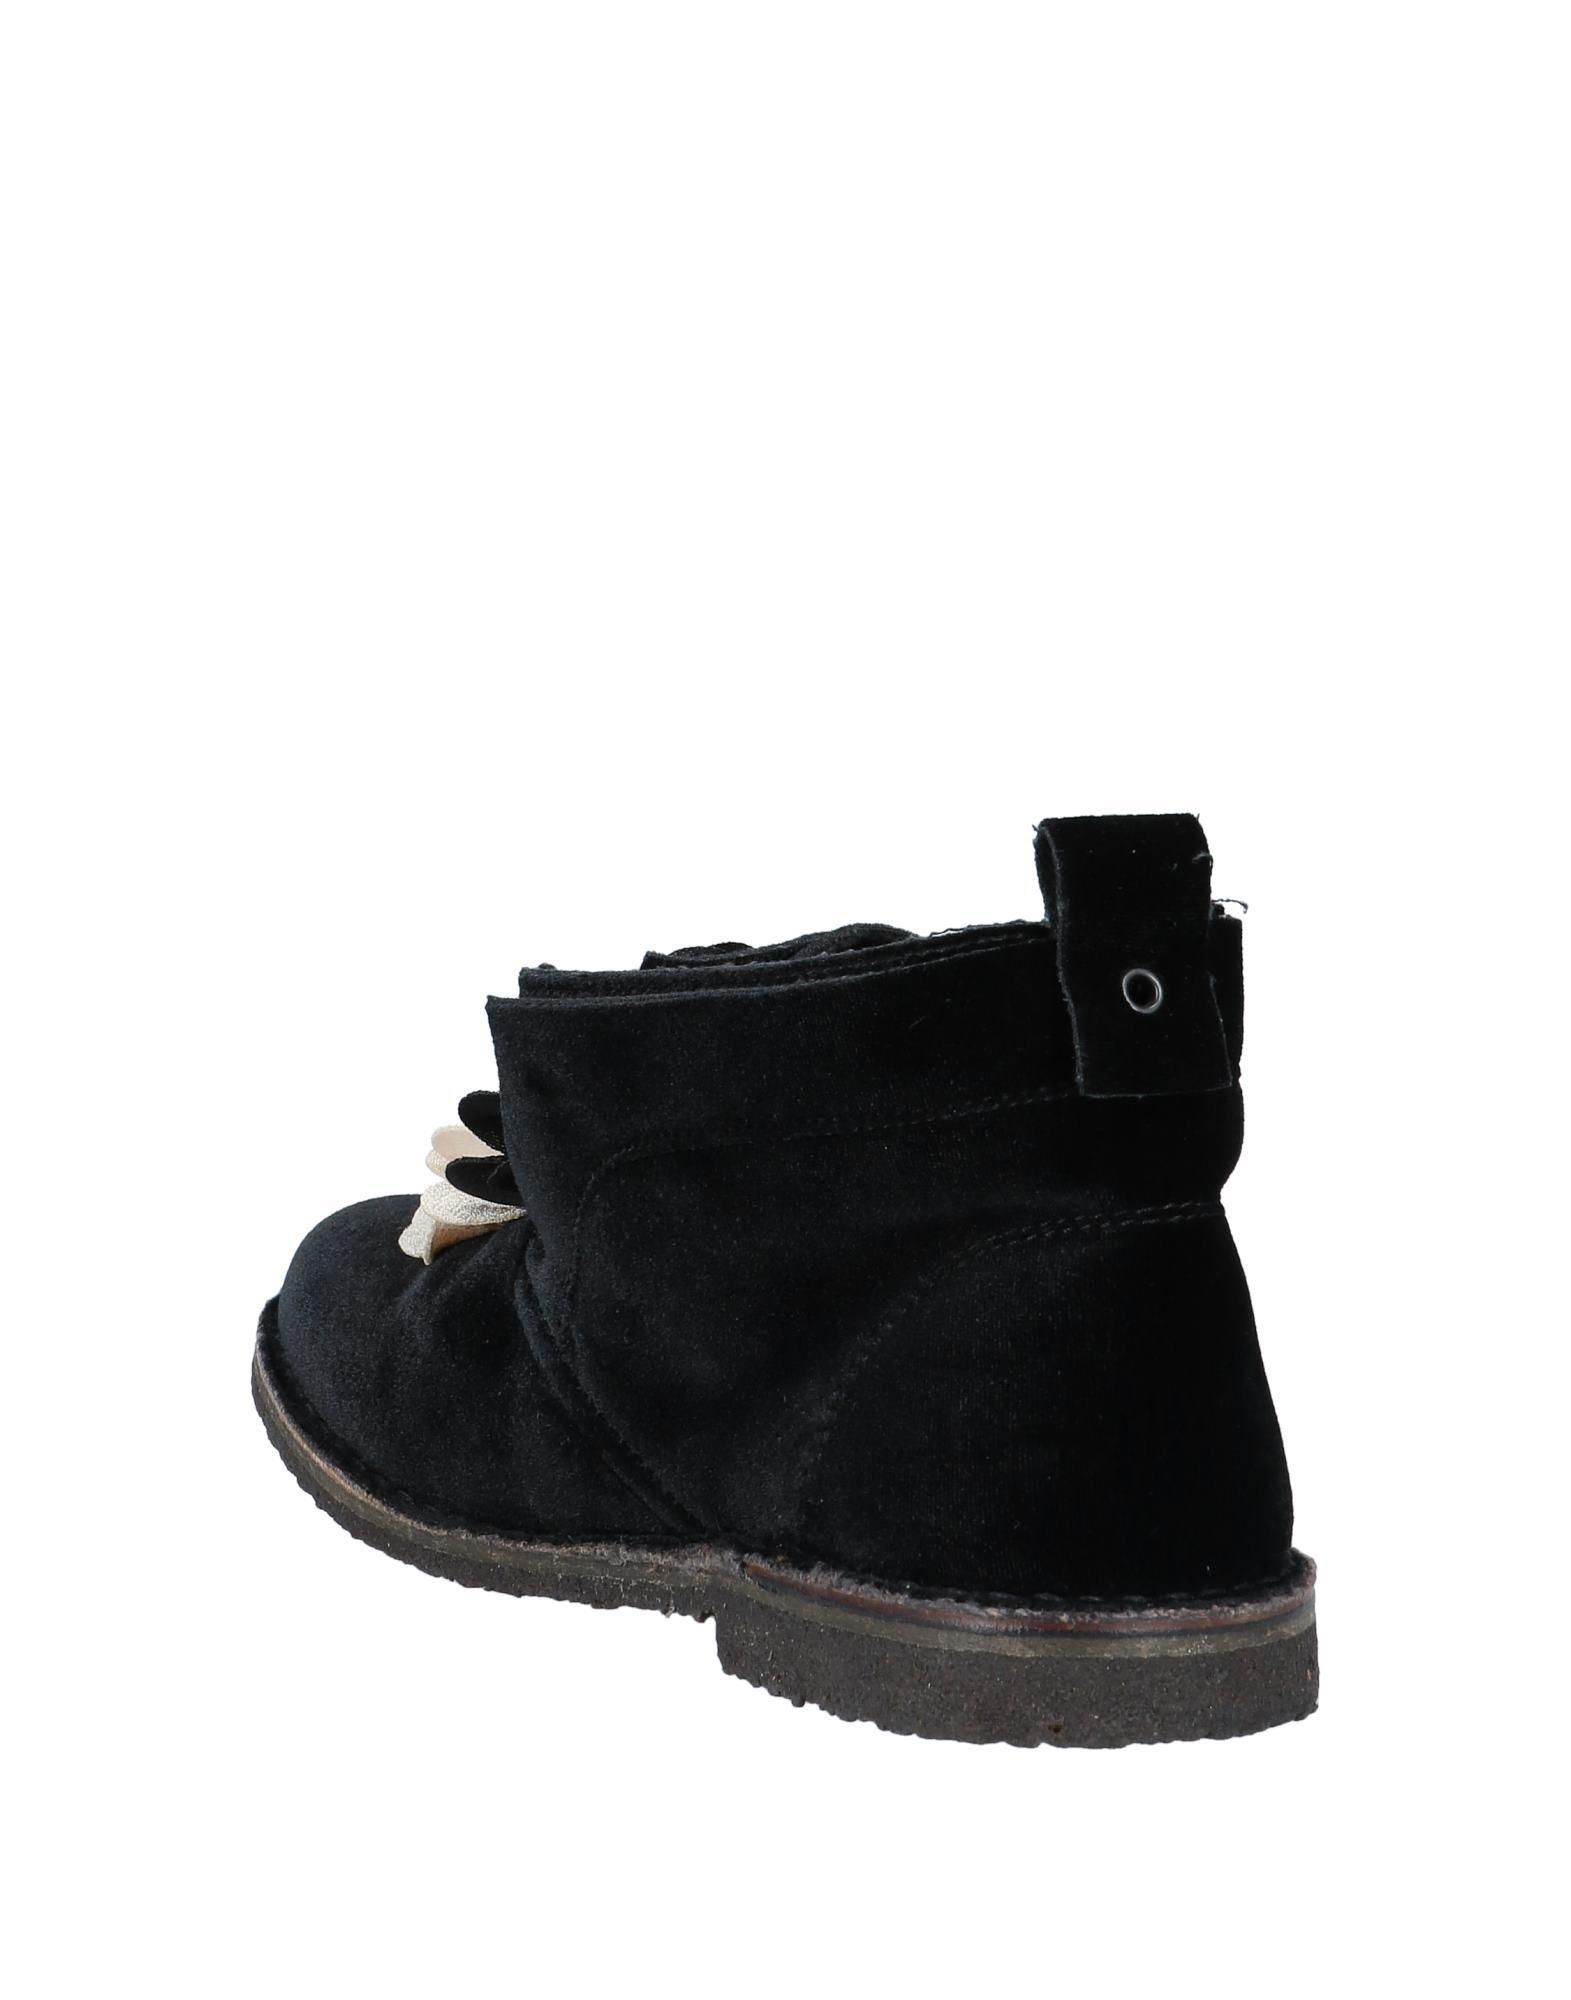 Botines de caña alta Pokemaoke de Terciopelo de color Negro